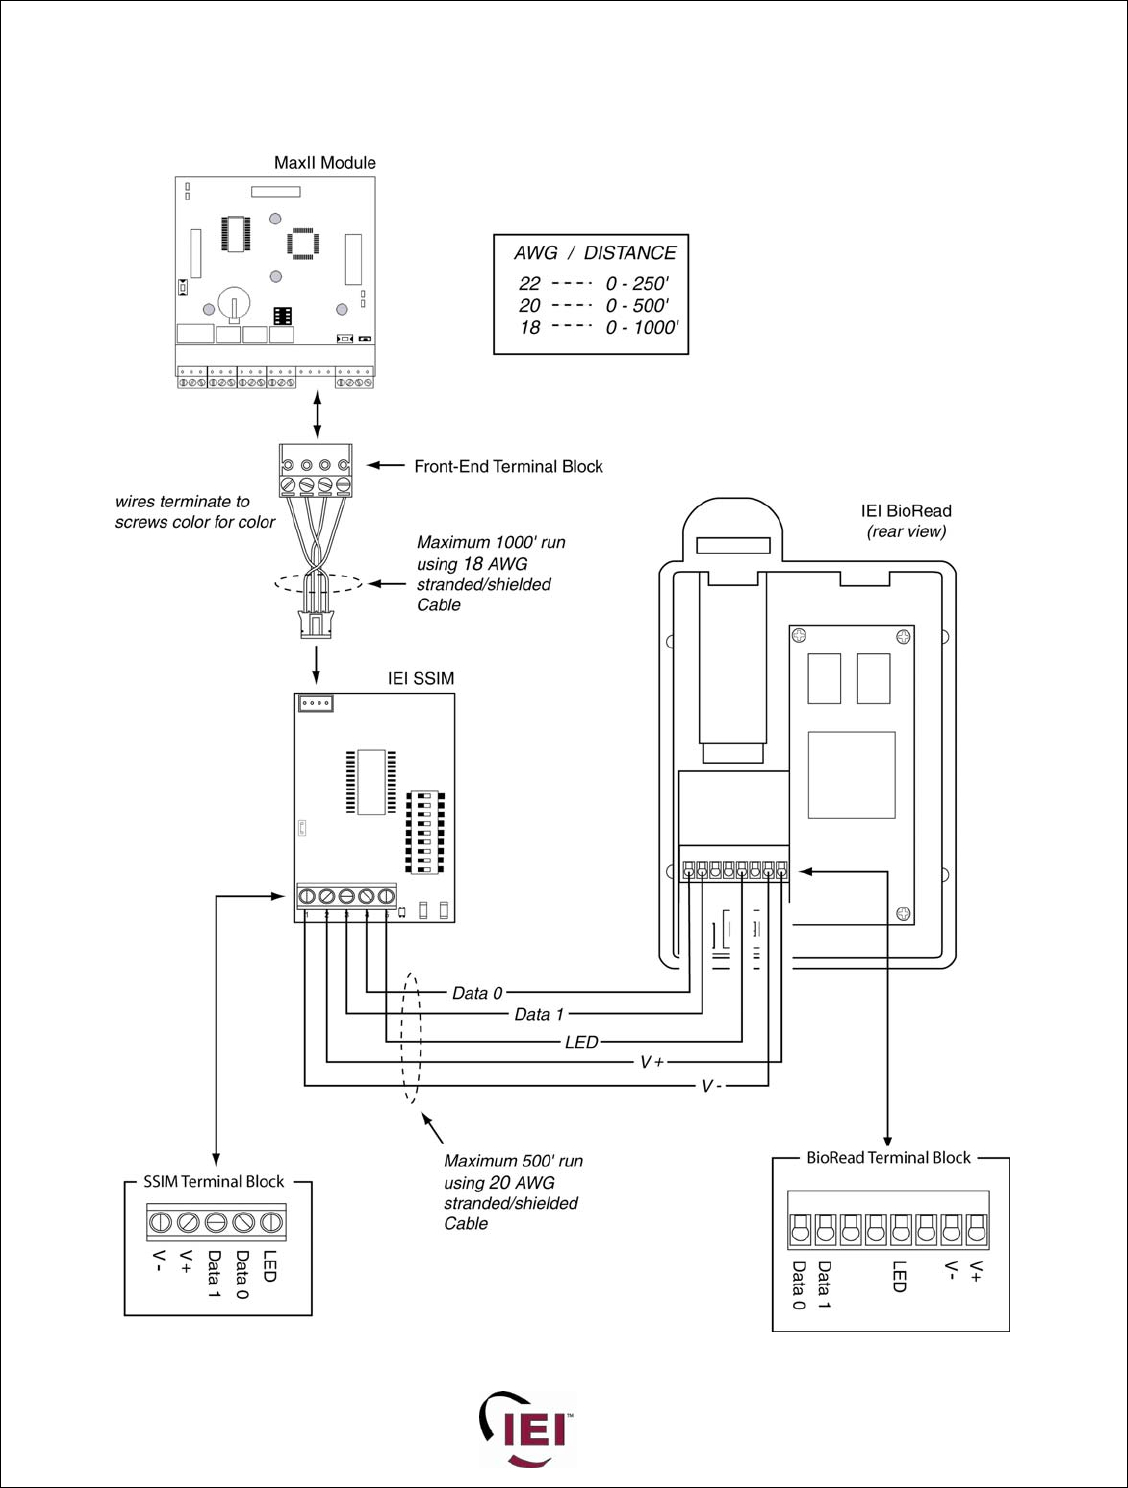 door lock wiring diagram online wiring diagram 2001 Chevy Suburban Engine Diagram magnetic lock wiring diagram wiring diagram databasewiring diagram to maglock iei keypad wiring schematic diagram door